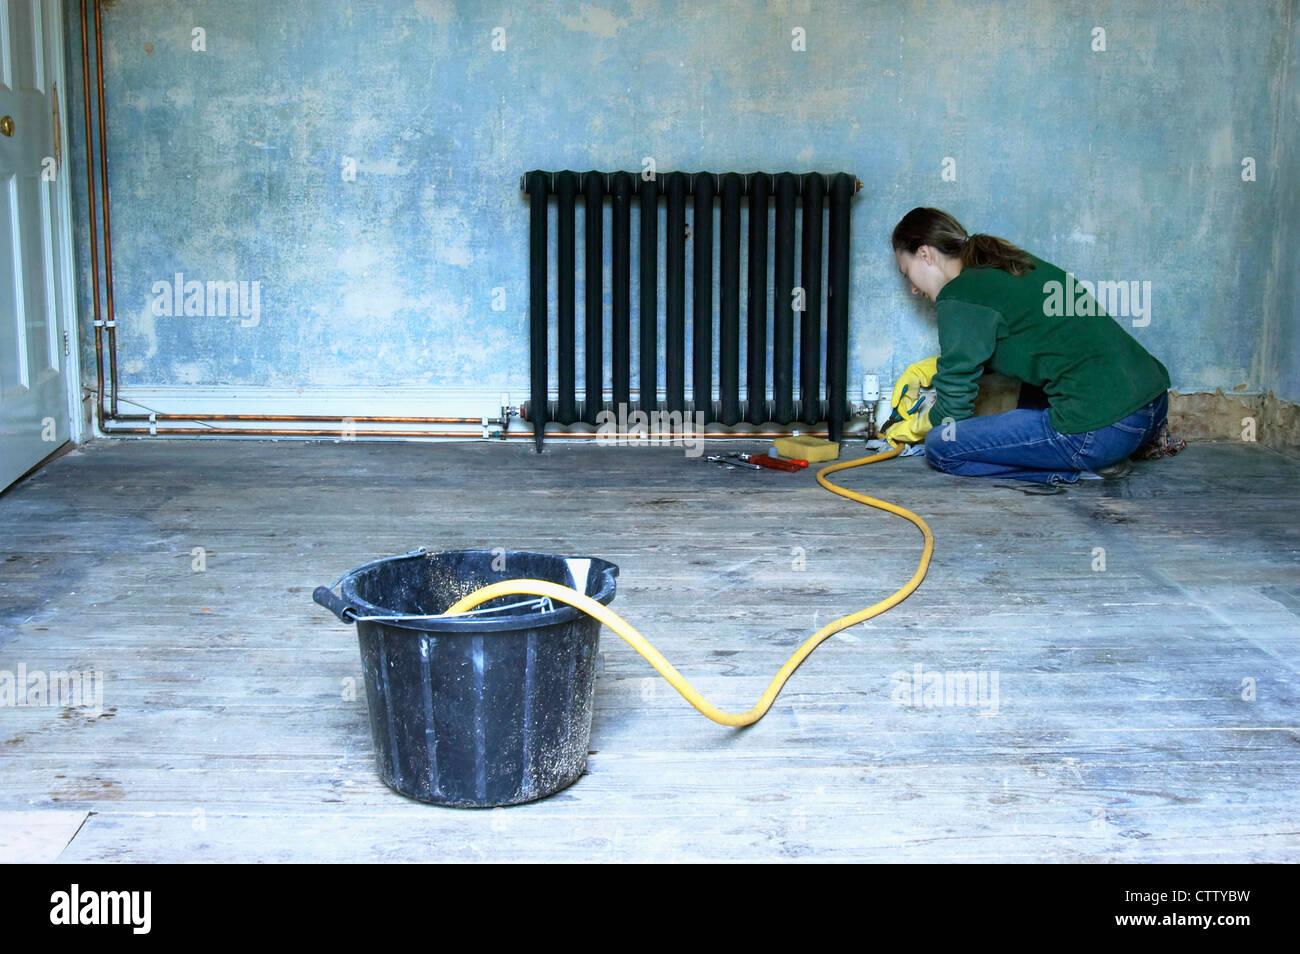 Domestic Home Heating Stockfotos & Domestic Home Heating Bilder ...